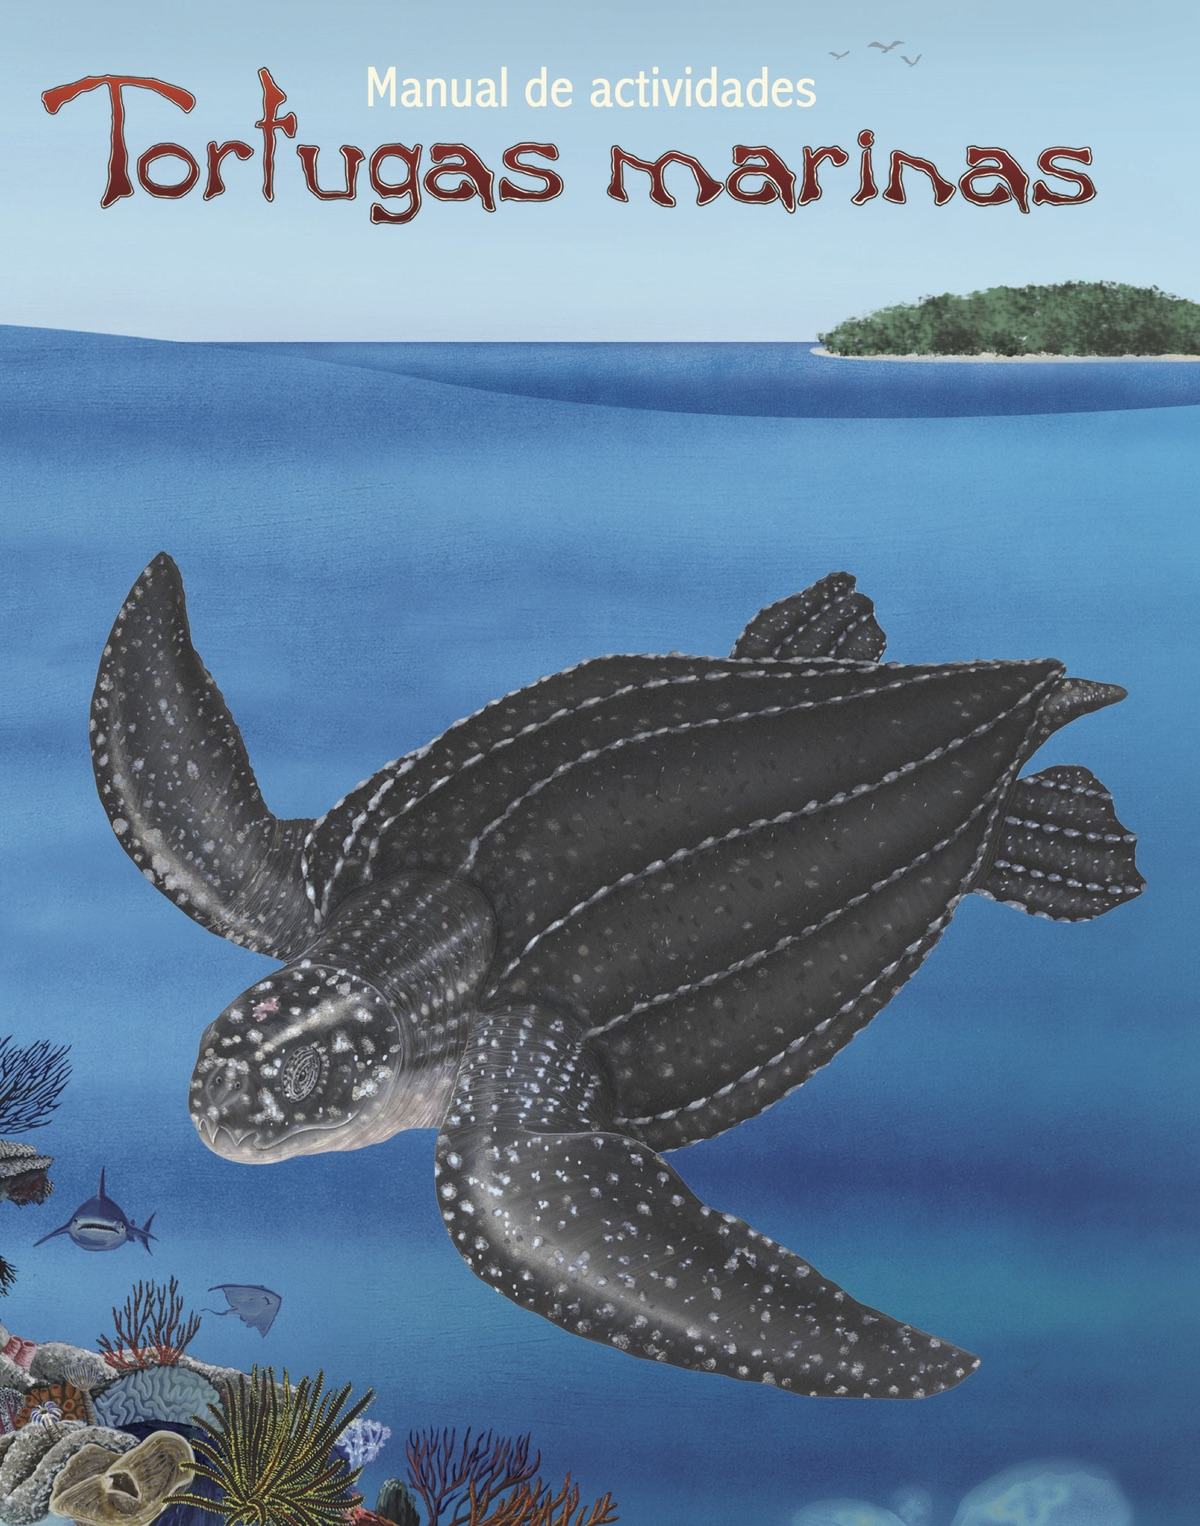 Tortugas marinas: Manual de actividades